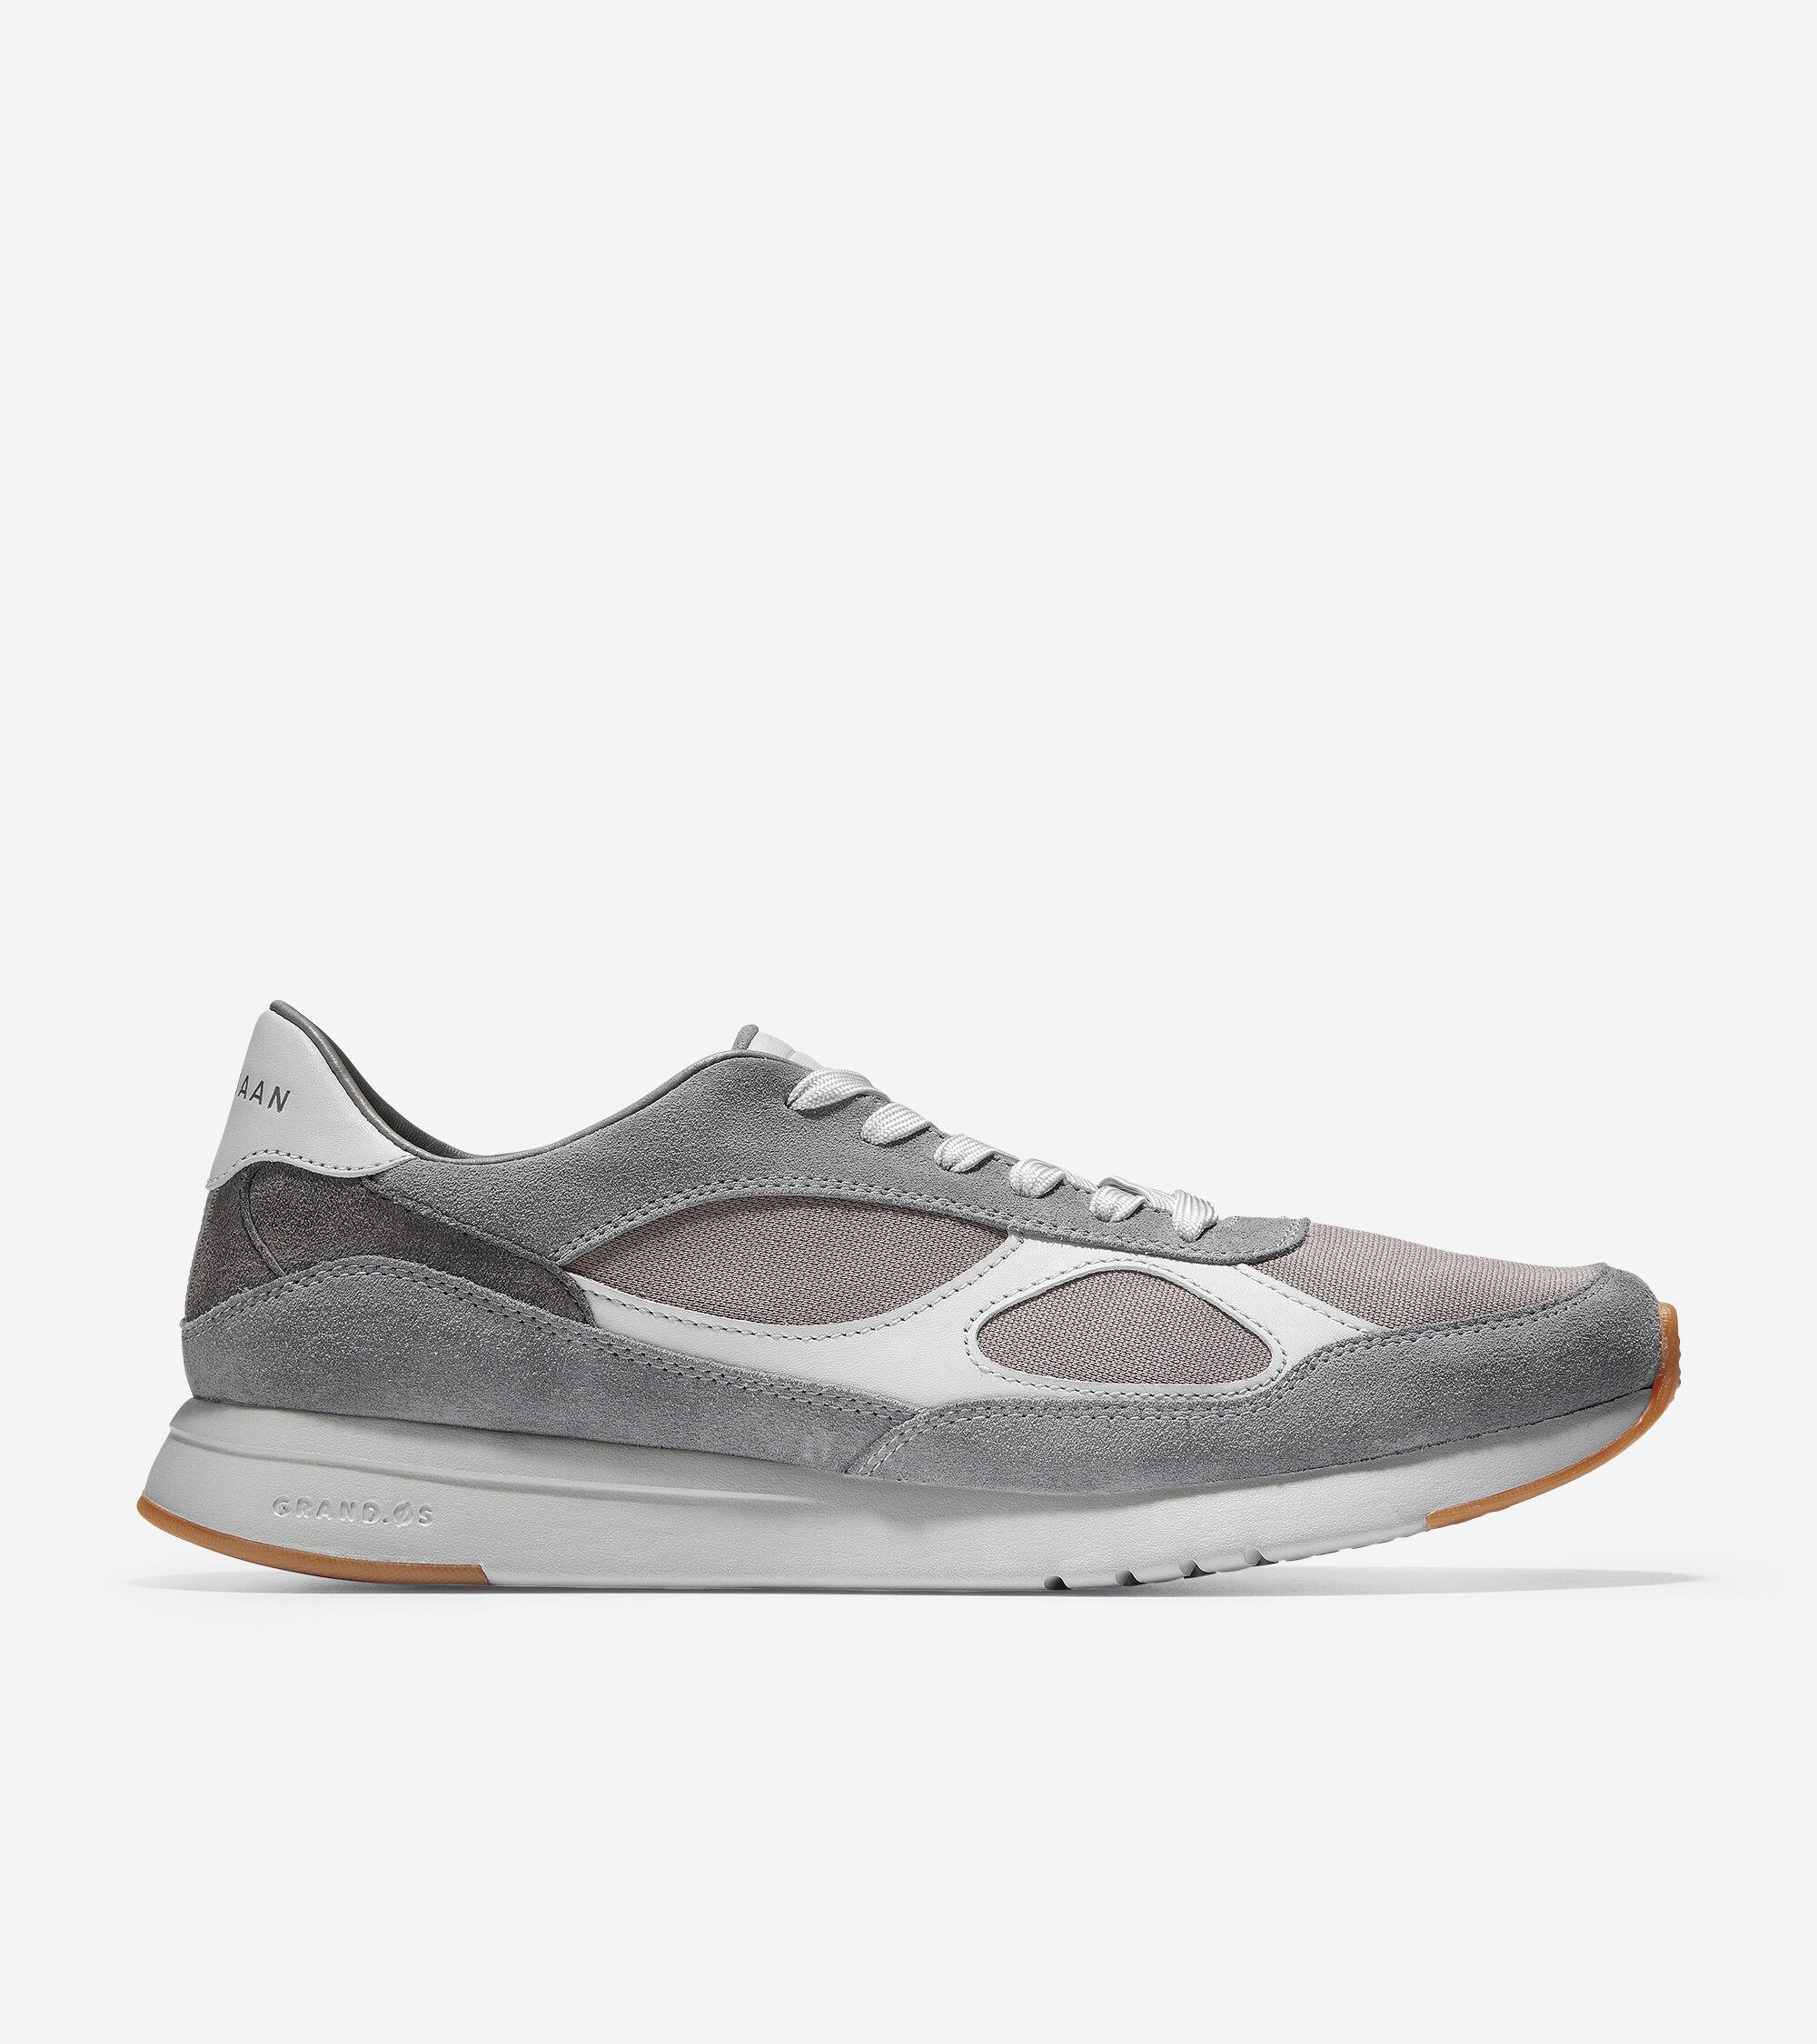 Ironstone Suede-Vapor Grey